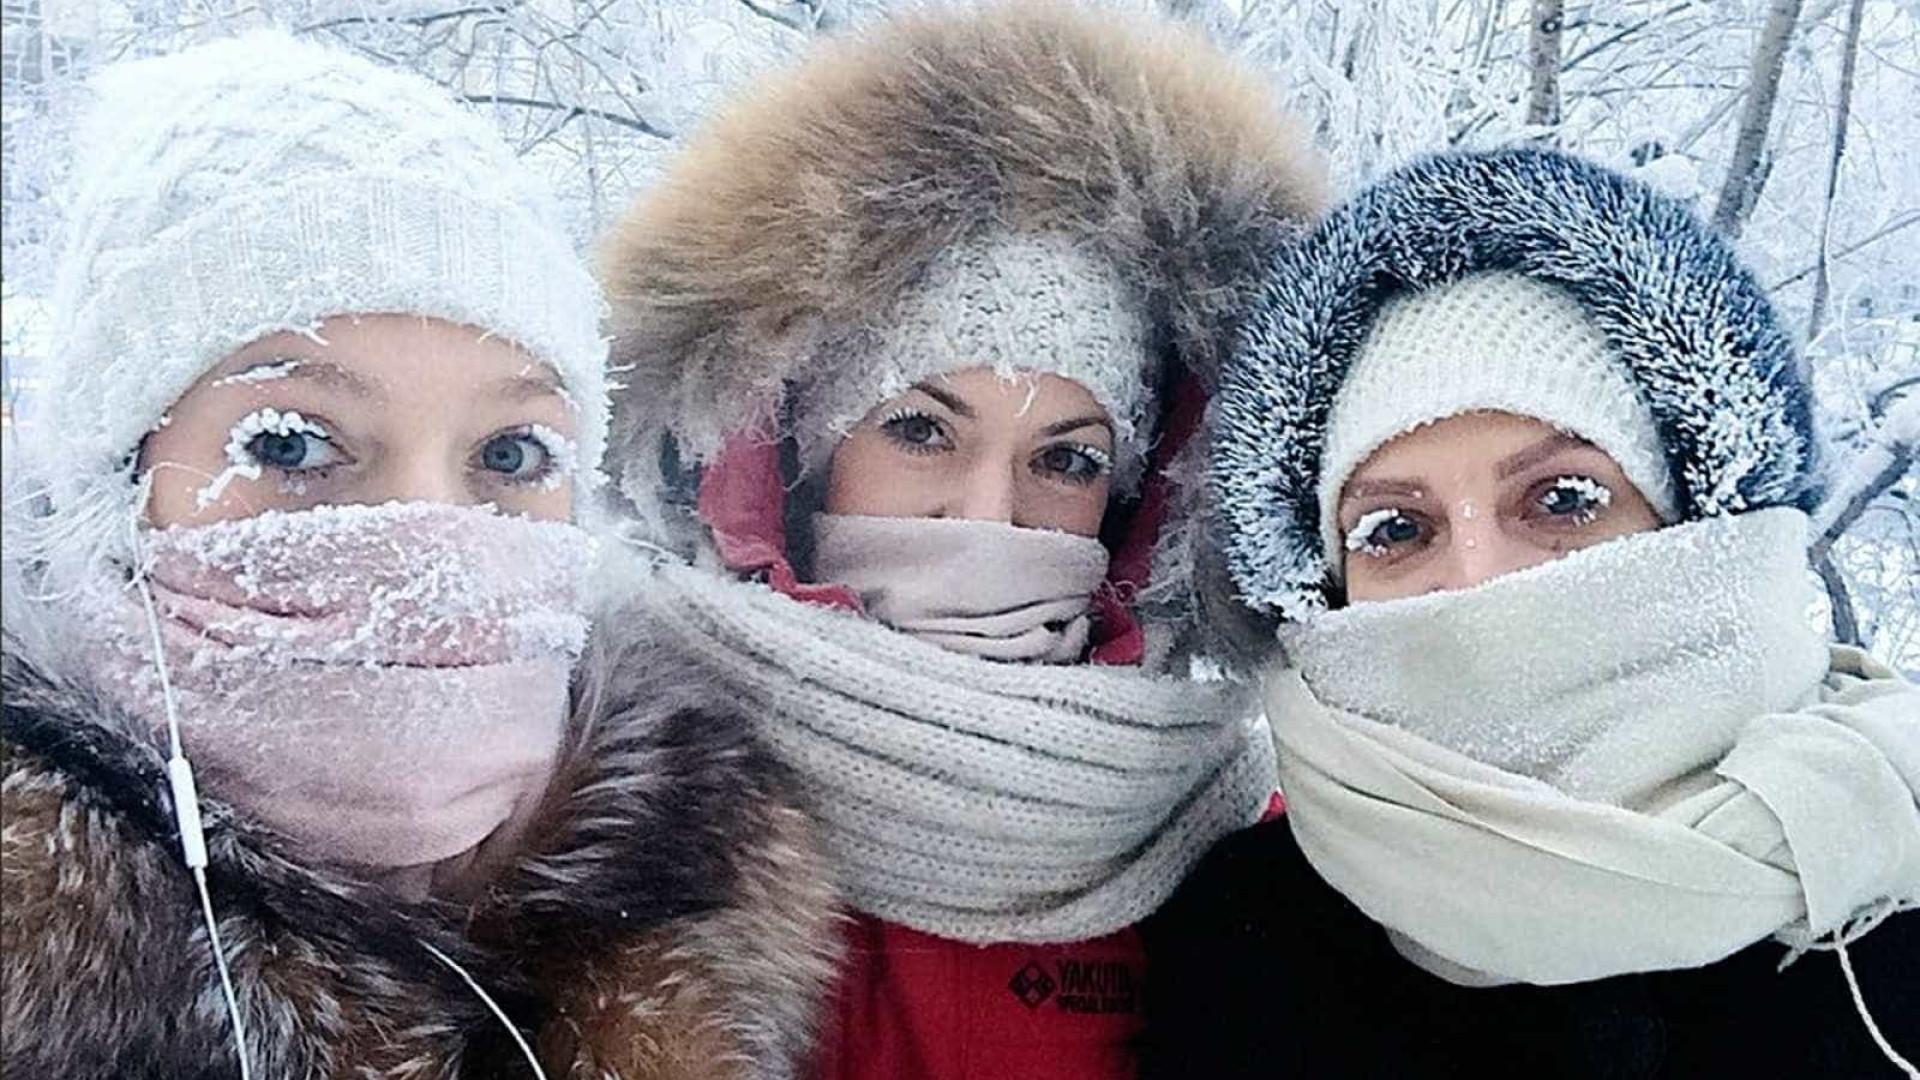 Temperatura na Rússia chega a - 67ºC. Veja imagens